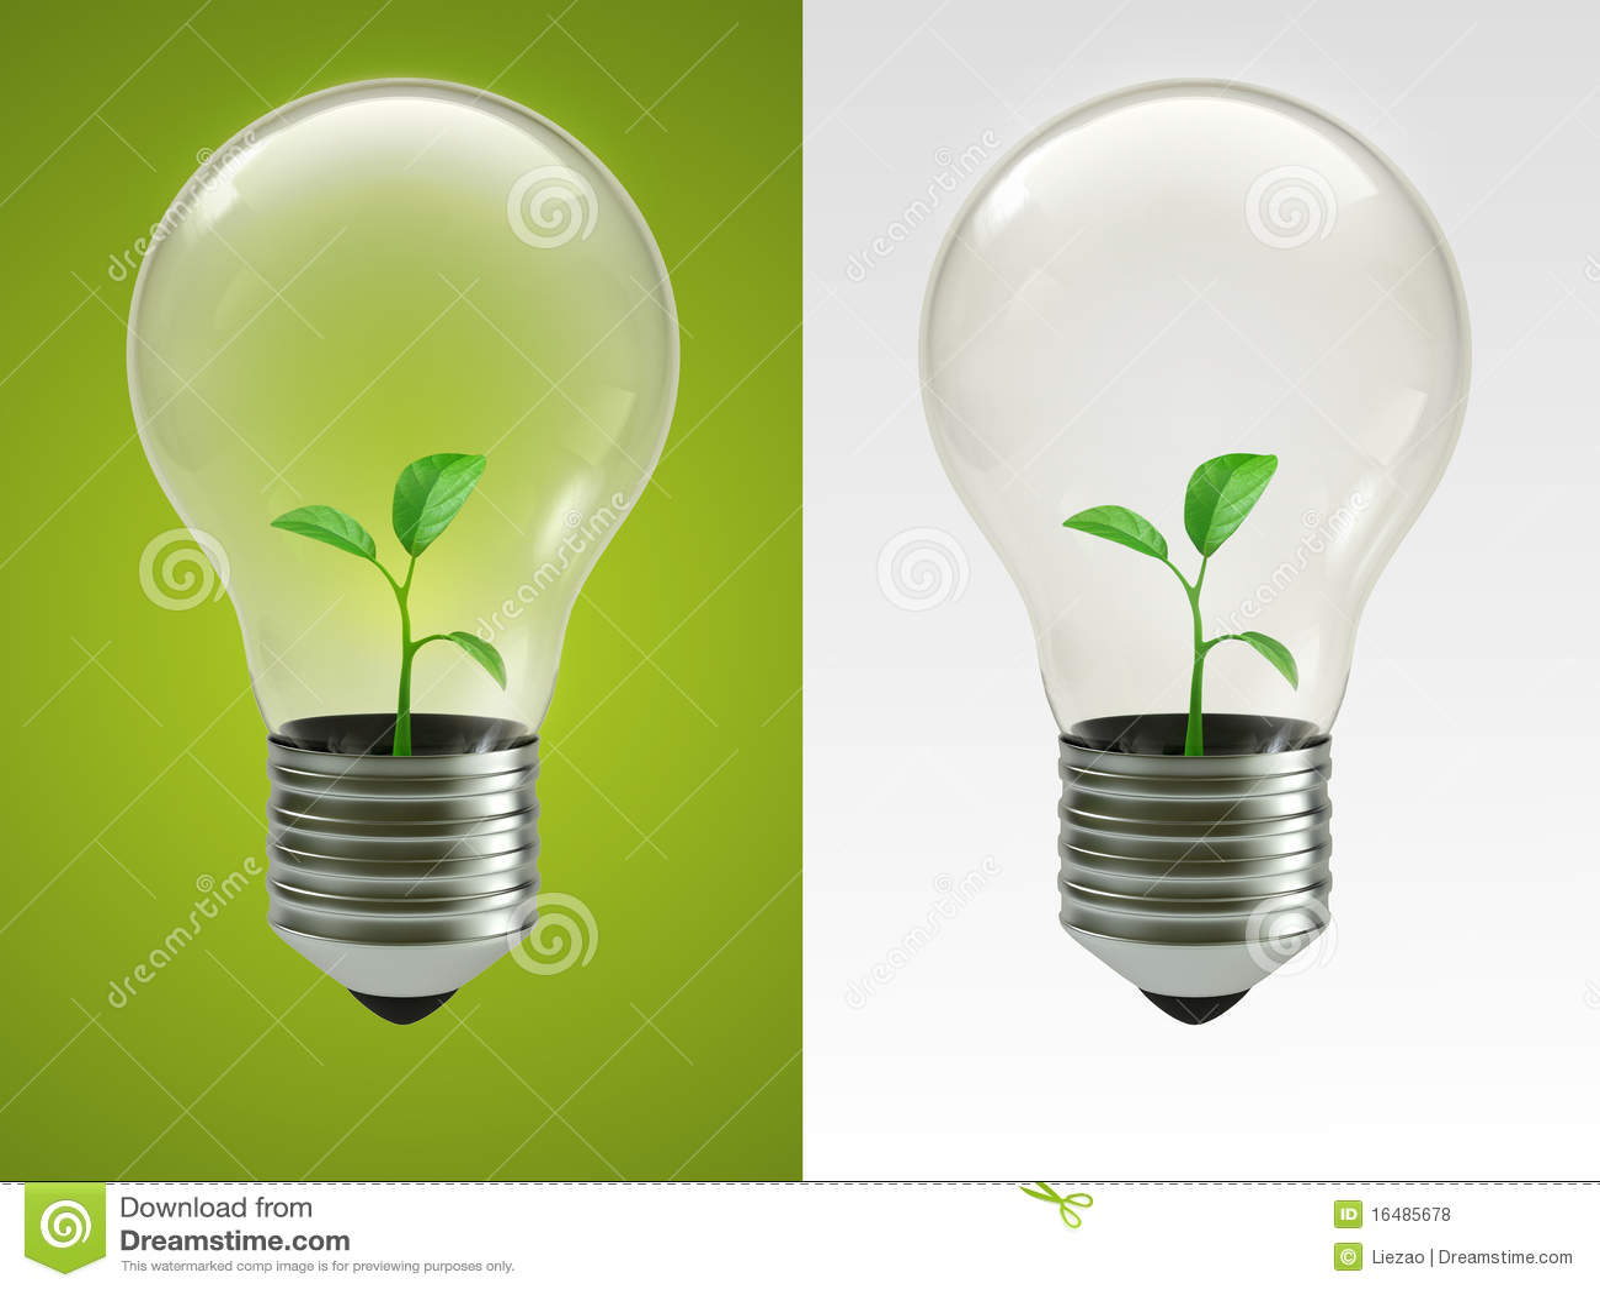 Eco Lamp Royalty Free Stock Photos Image 16485678